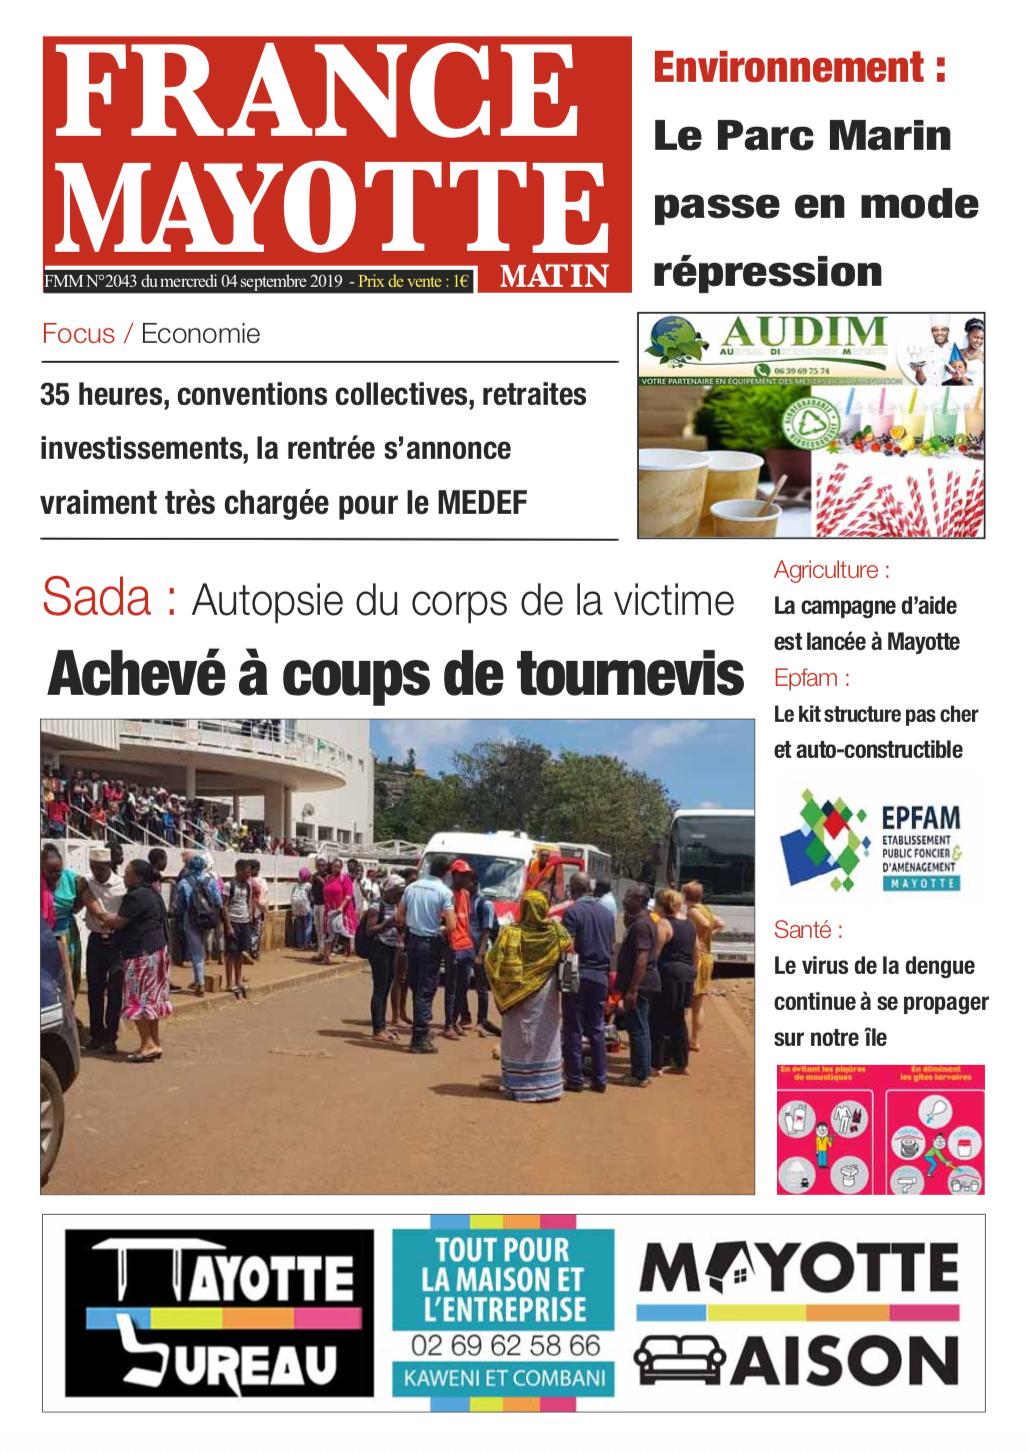 France Mayotte Mercredi 4 septembre 2019